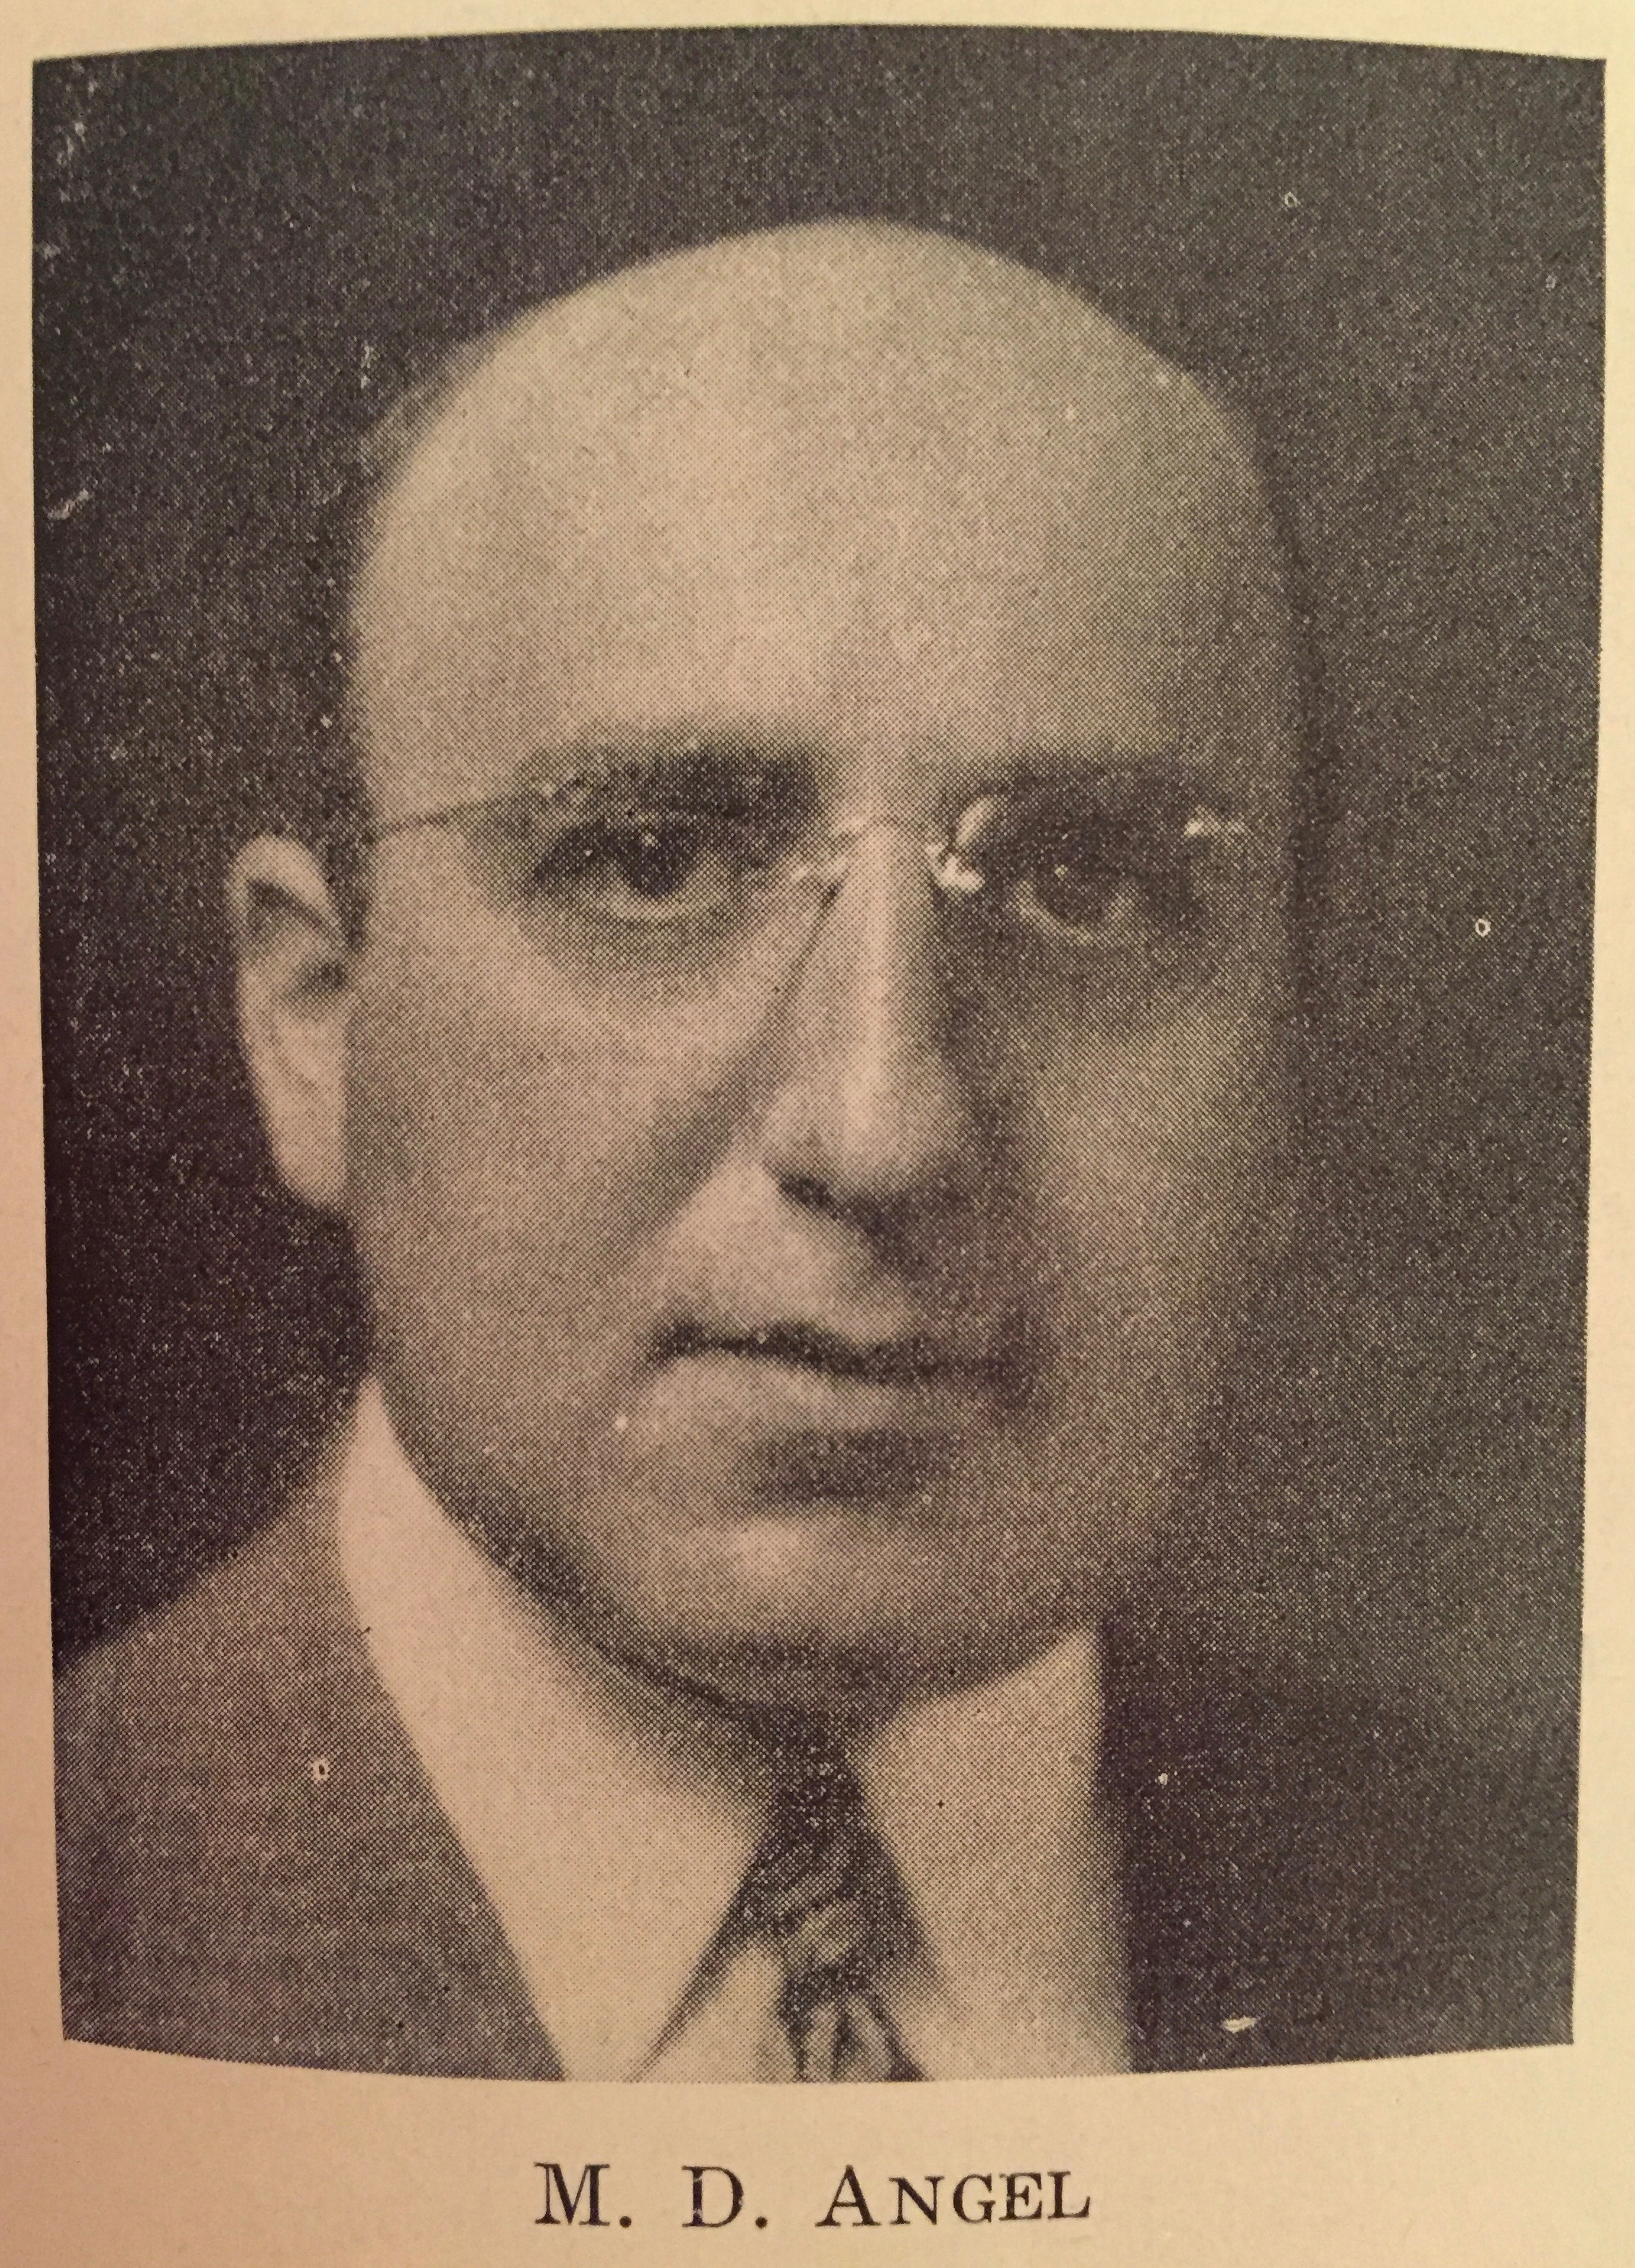 Max D. Angel